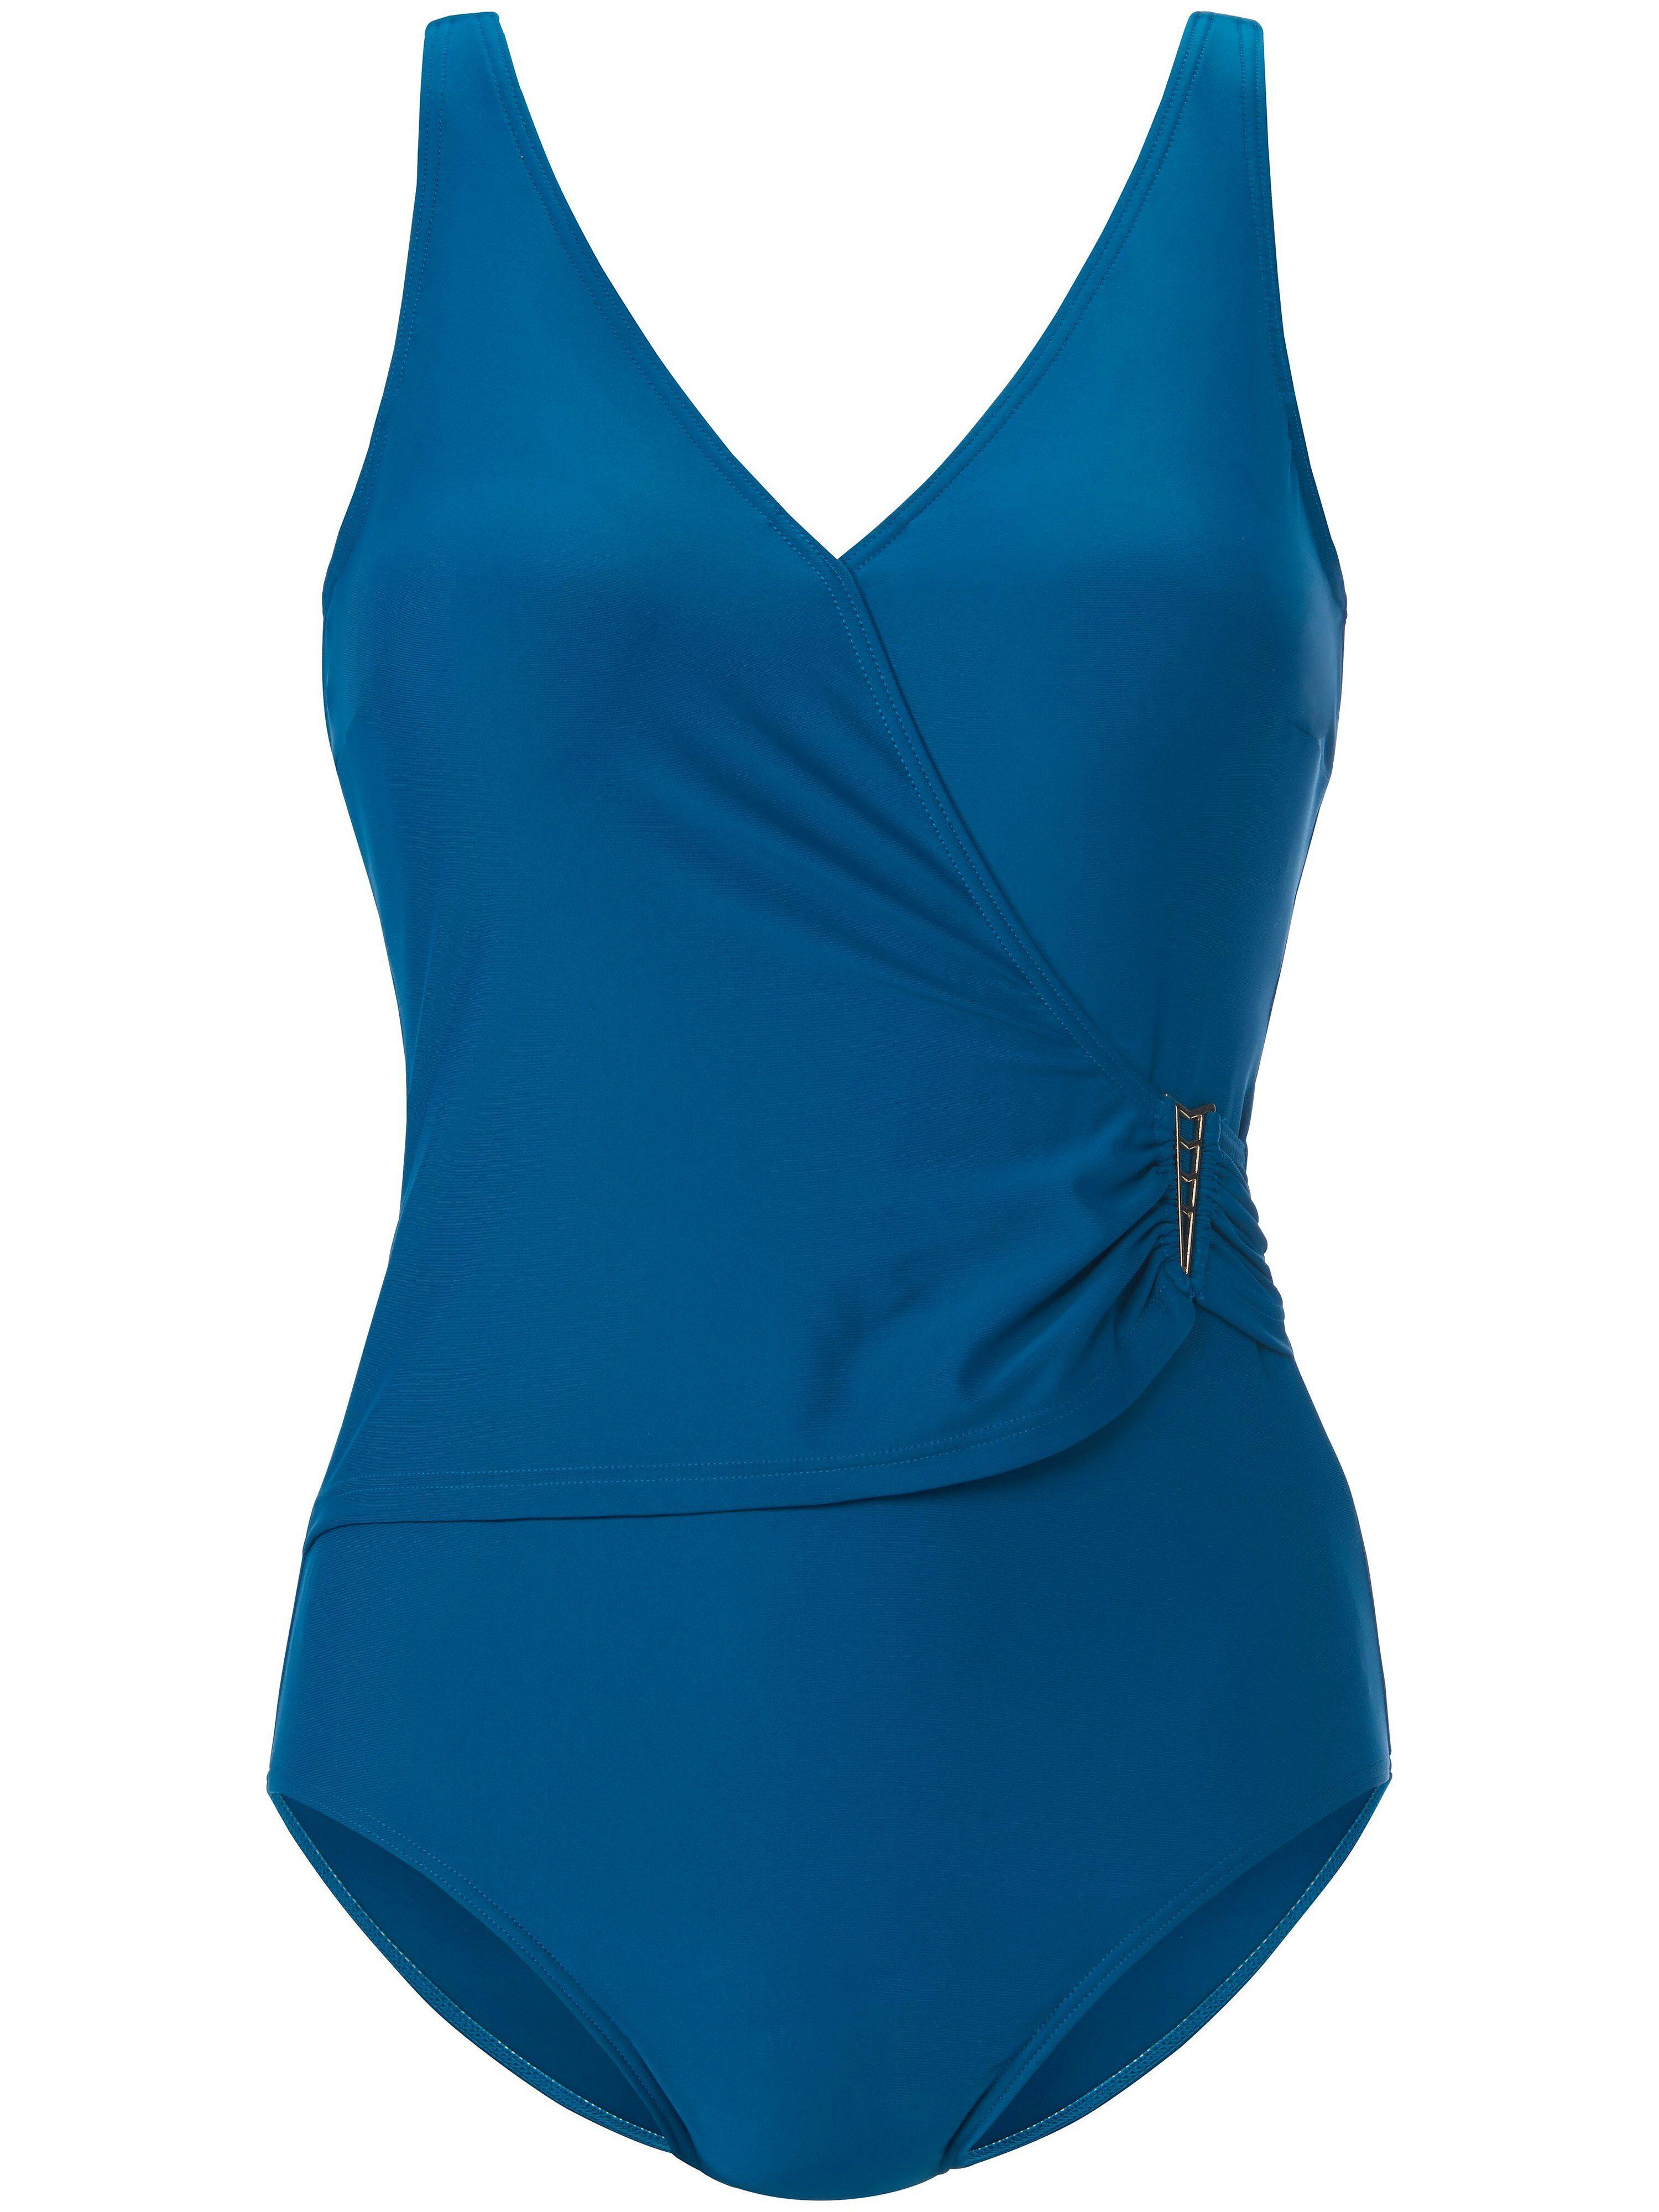 Naturana Le maillot bain semi-bustier style croisé  Naturana turquoise  - Femme - 46